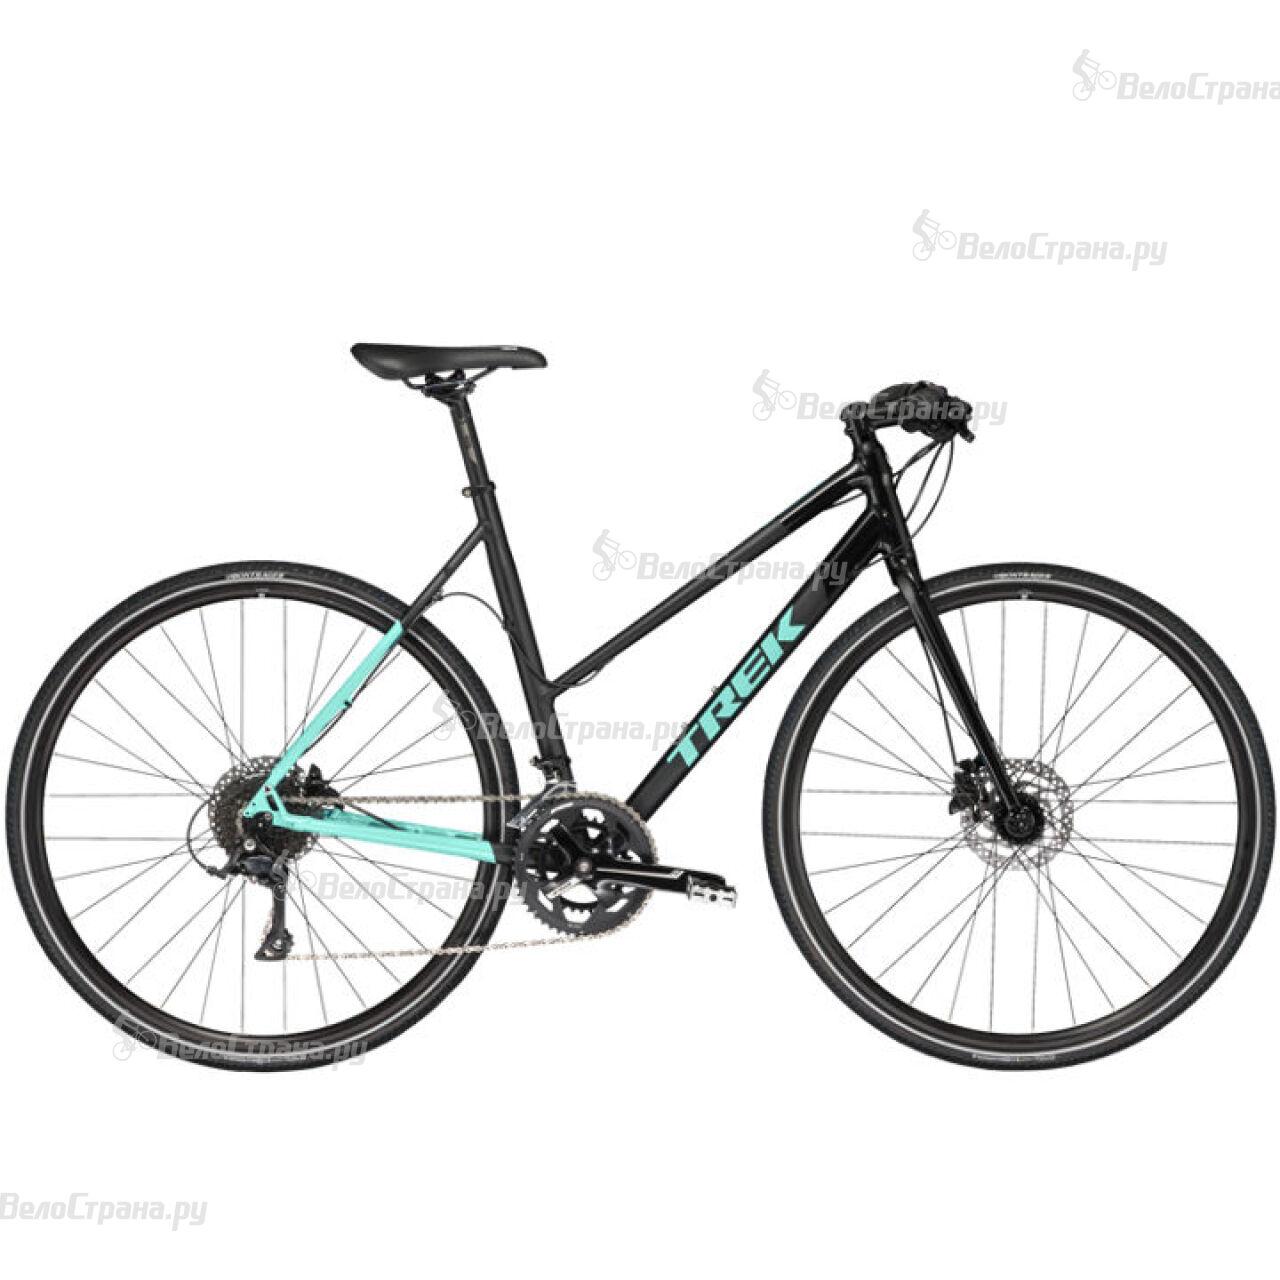 Велосипед Trek ZEKTOR 3 STAGGER (2017) велосипед trek fx stagger 2017